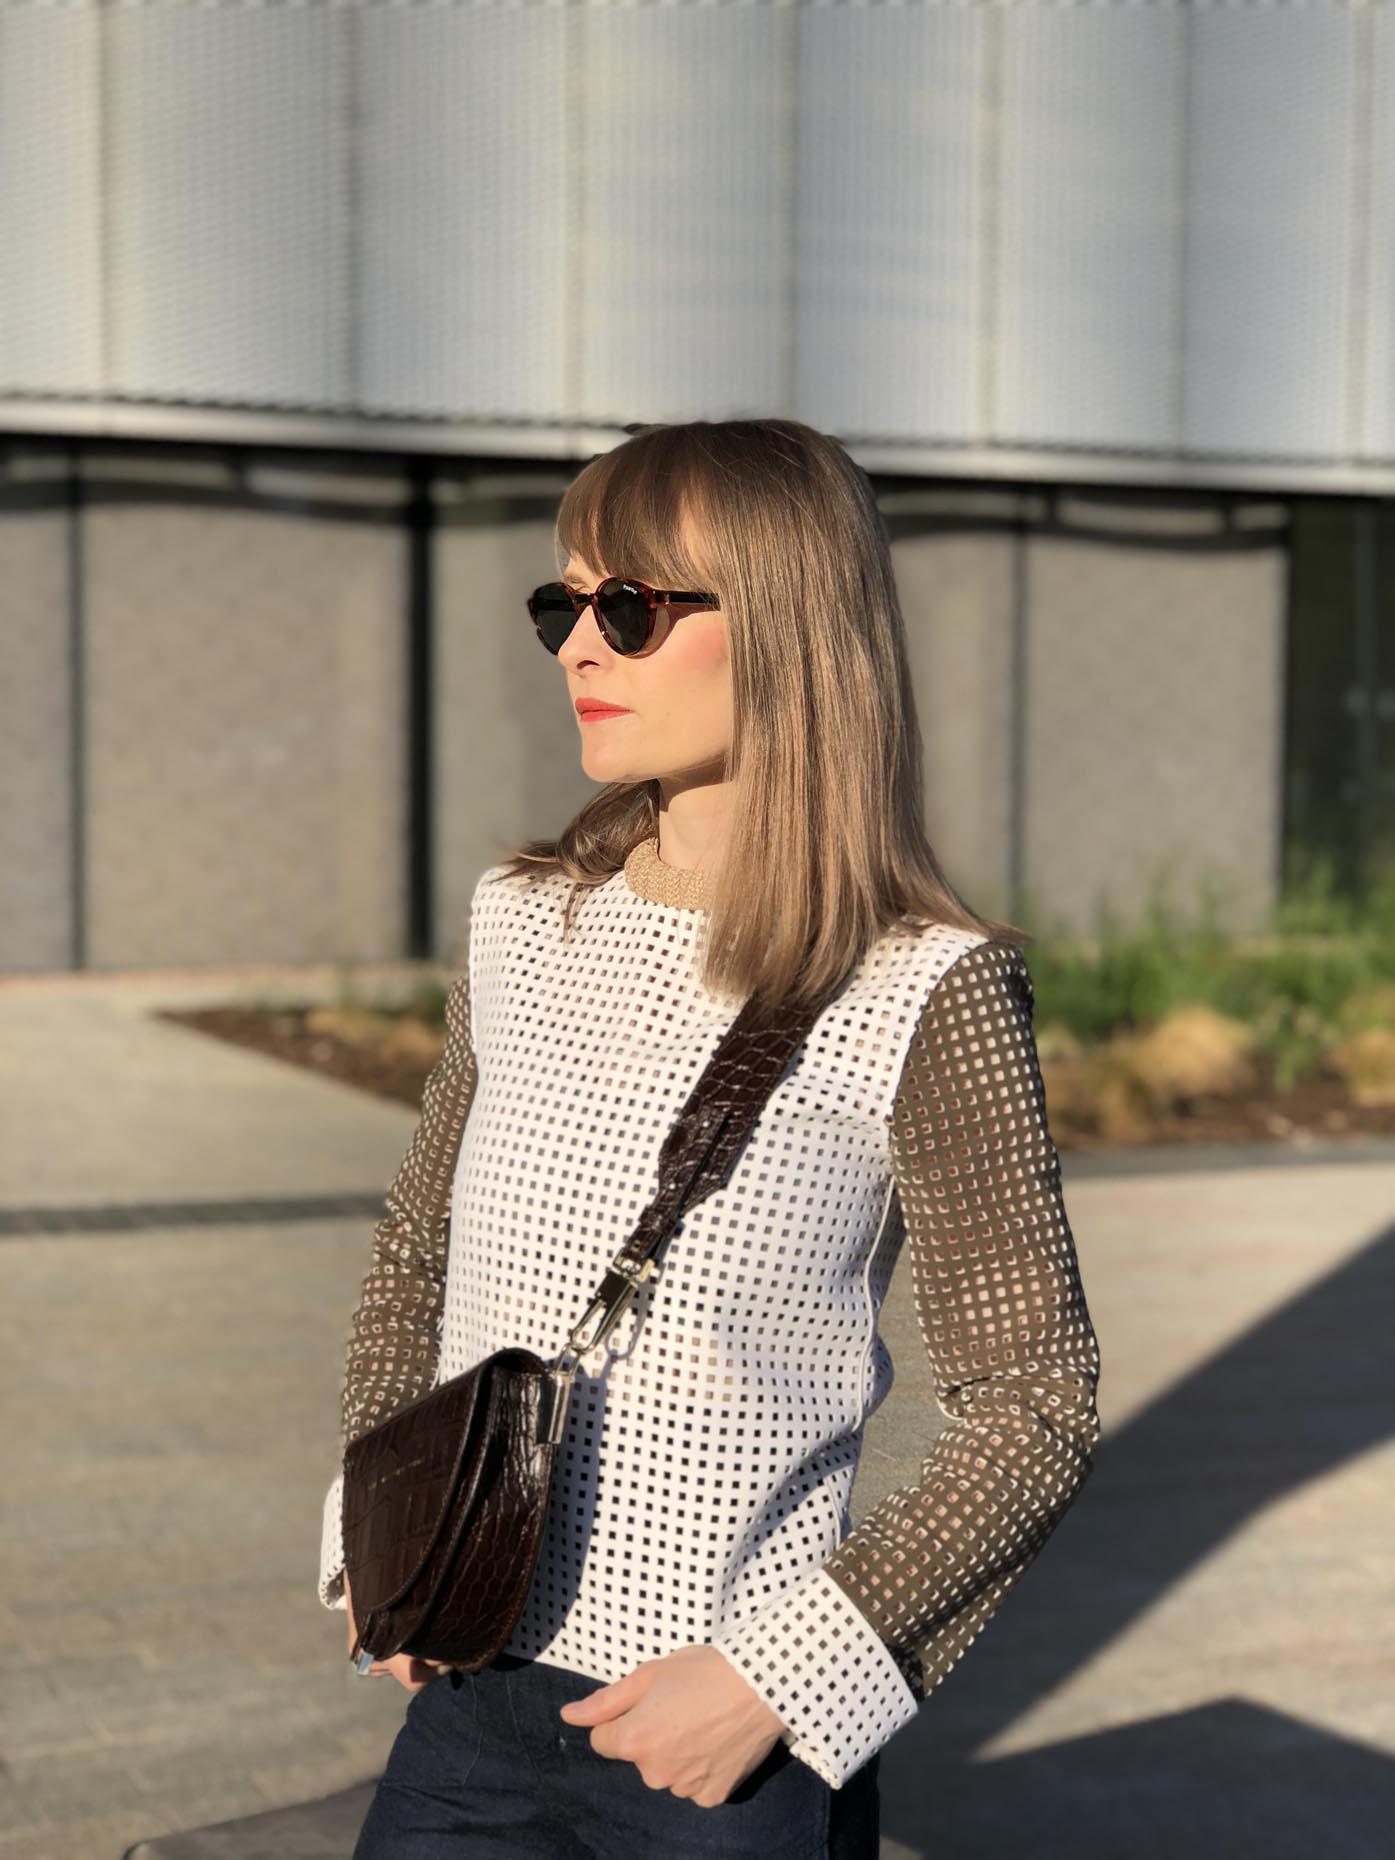 polaroid sunglasses saddle bag zofia chylak jw anderson top by fashion art media